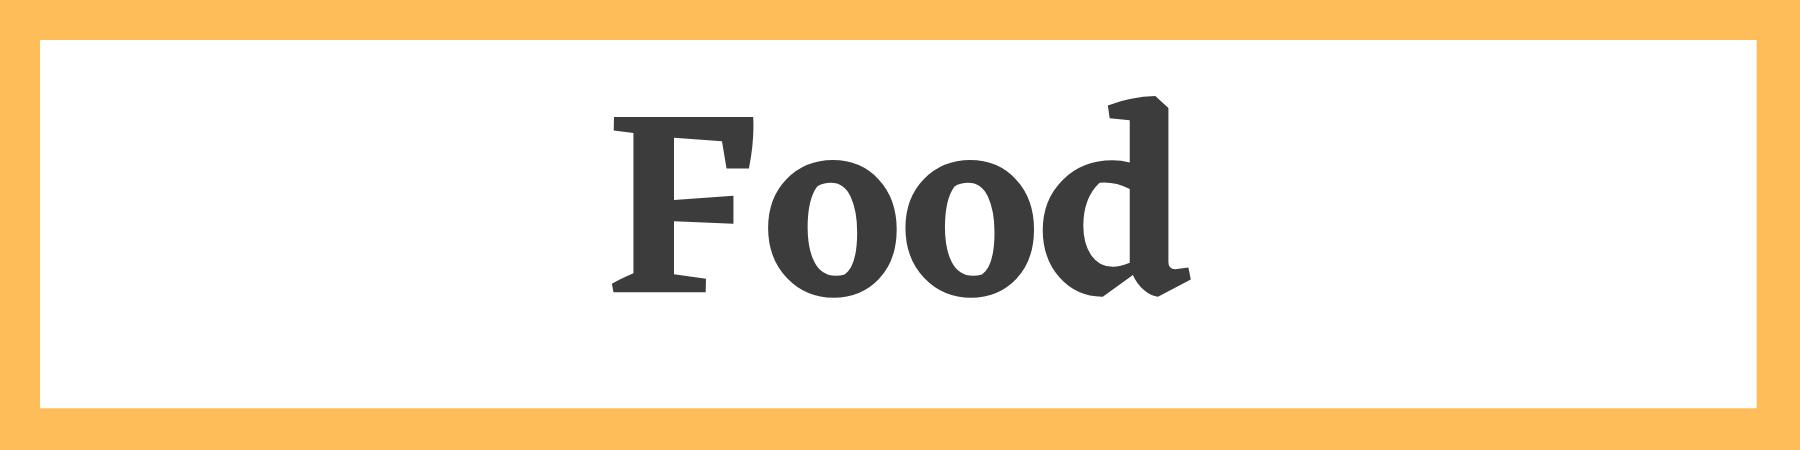 Food lbl